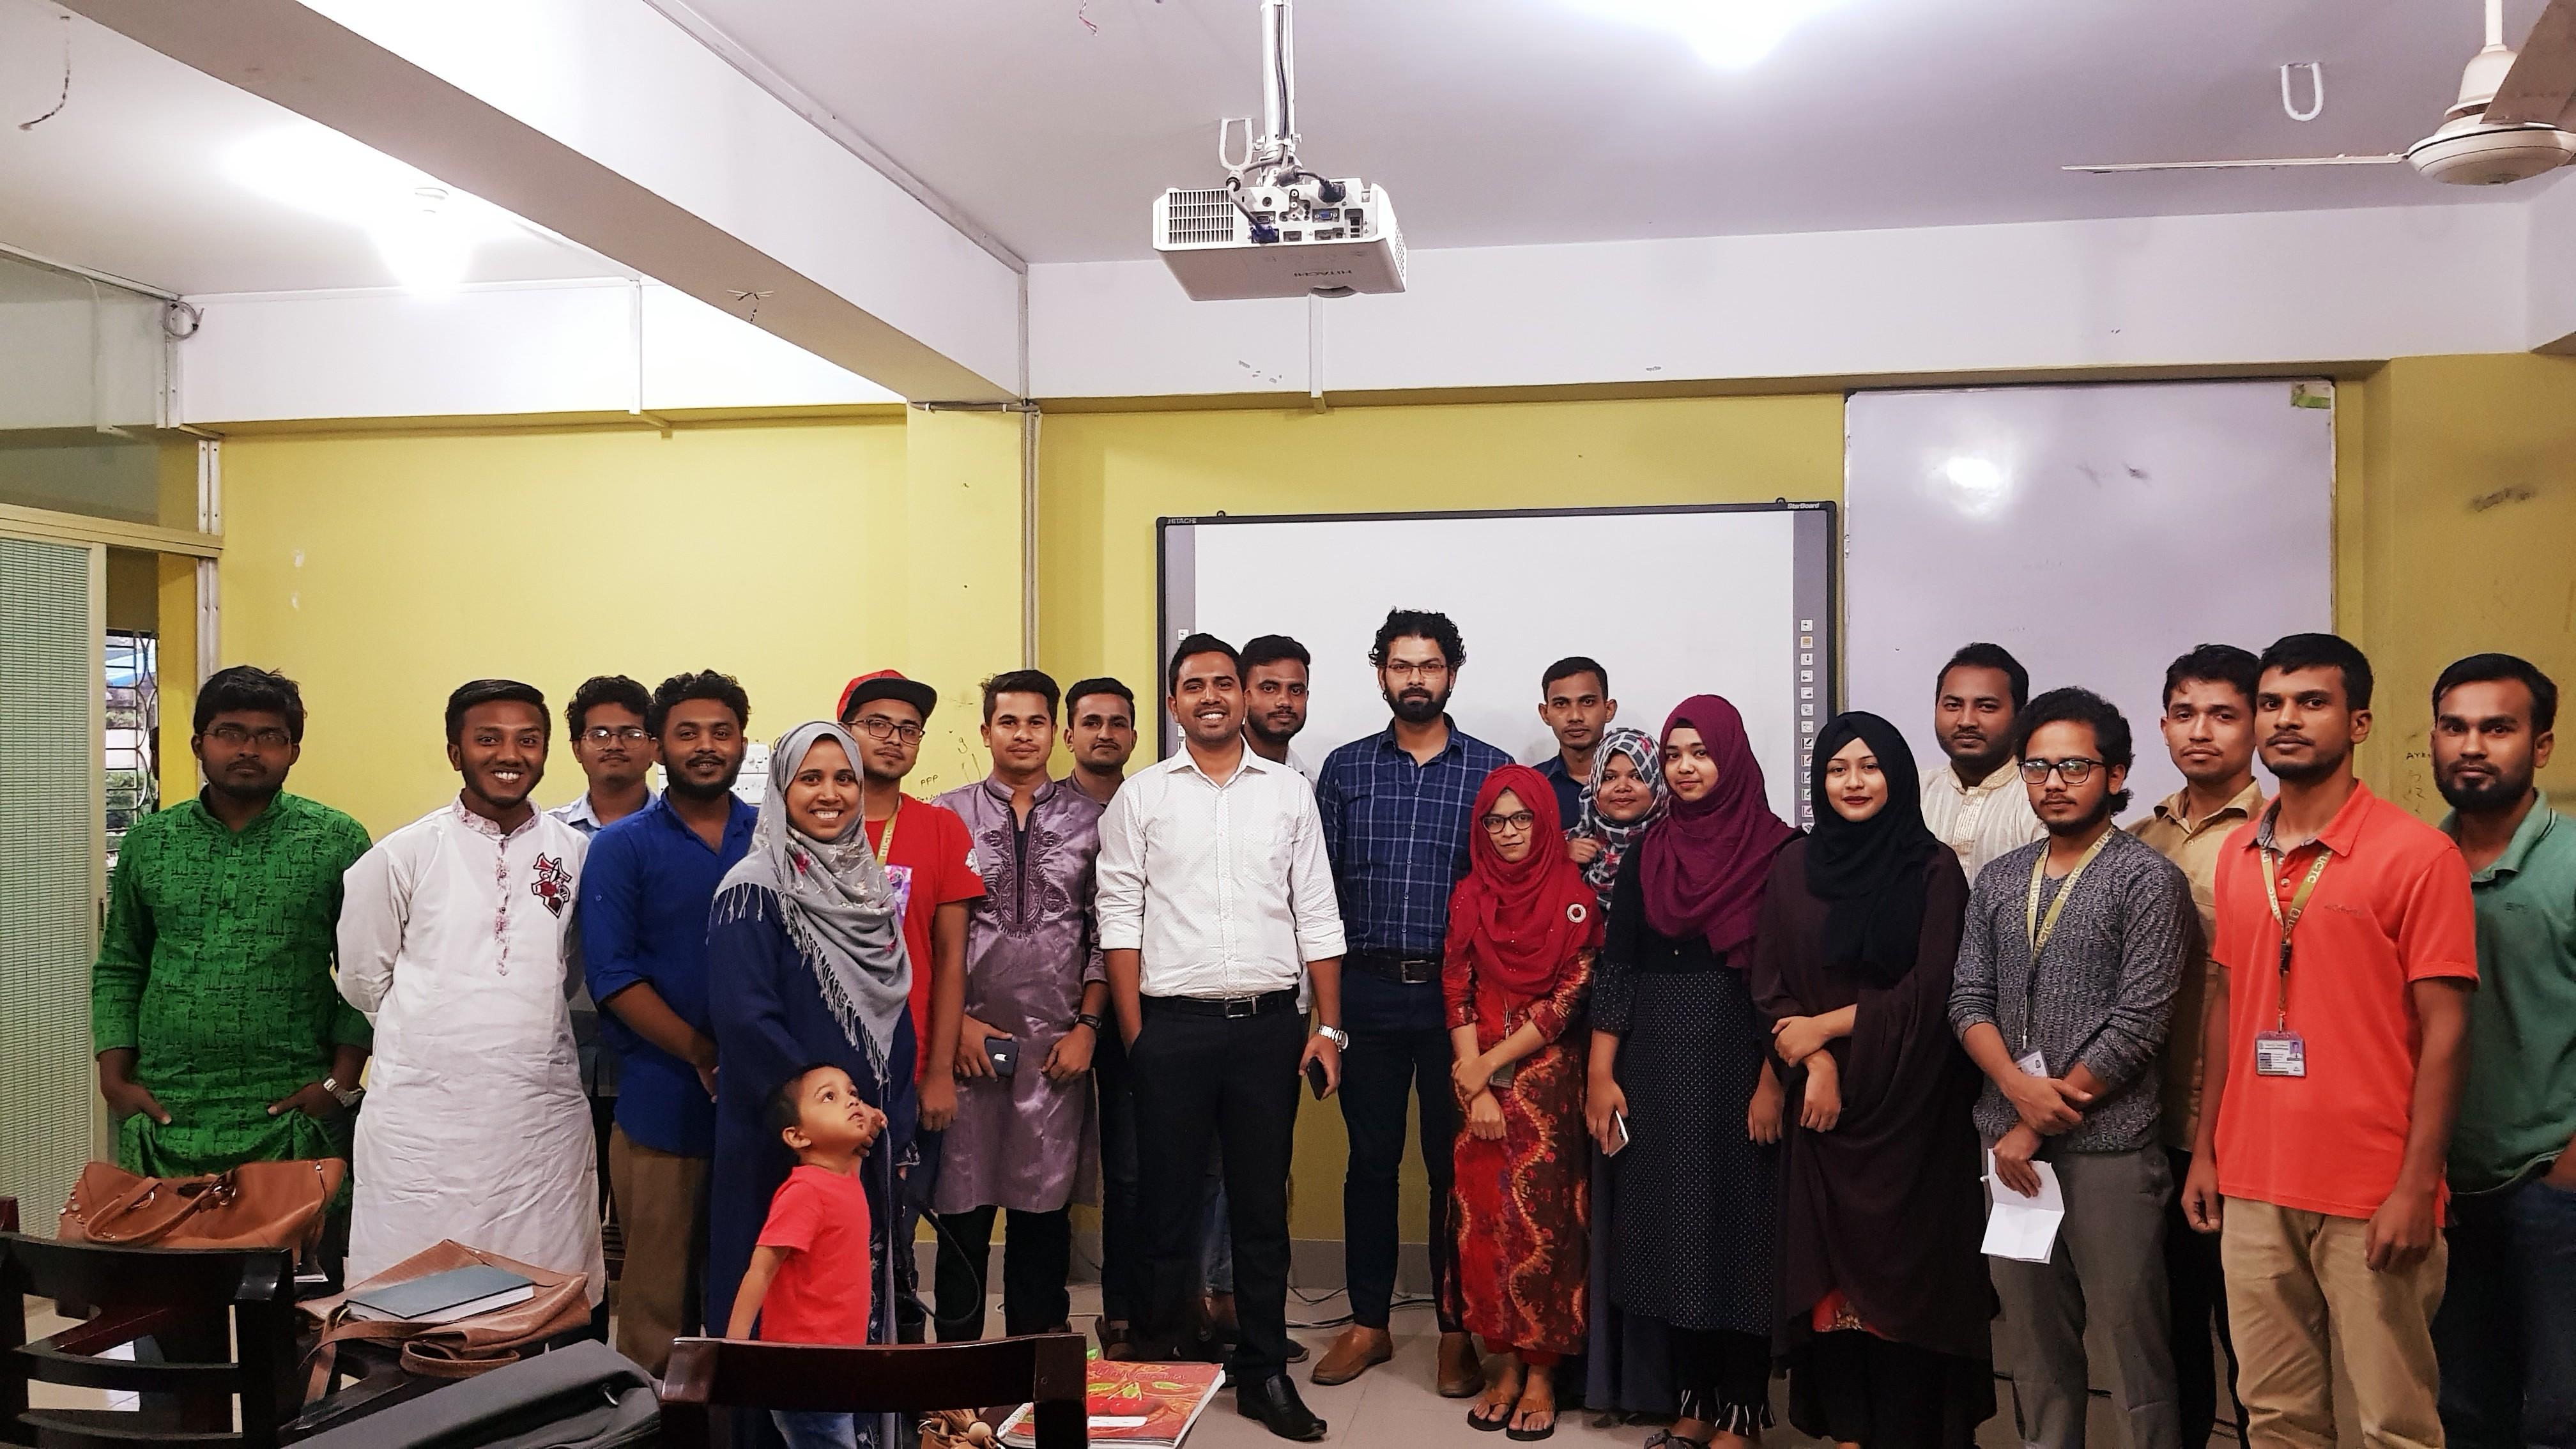 UCTC - Dristy Chittagong Debate Workshop - 2019